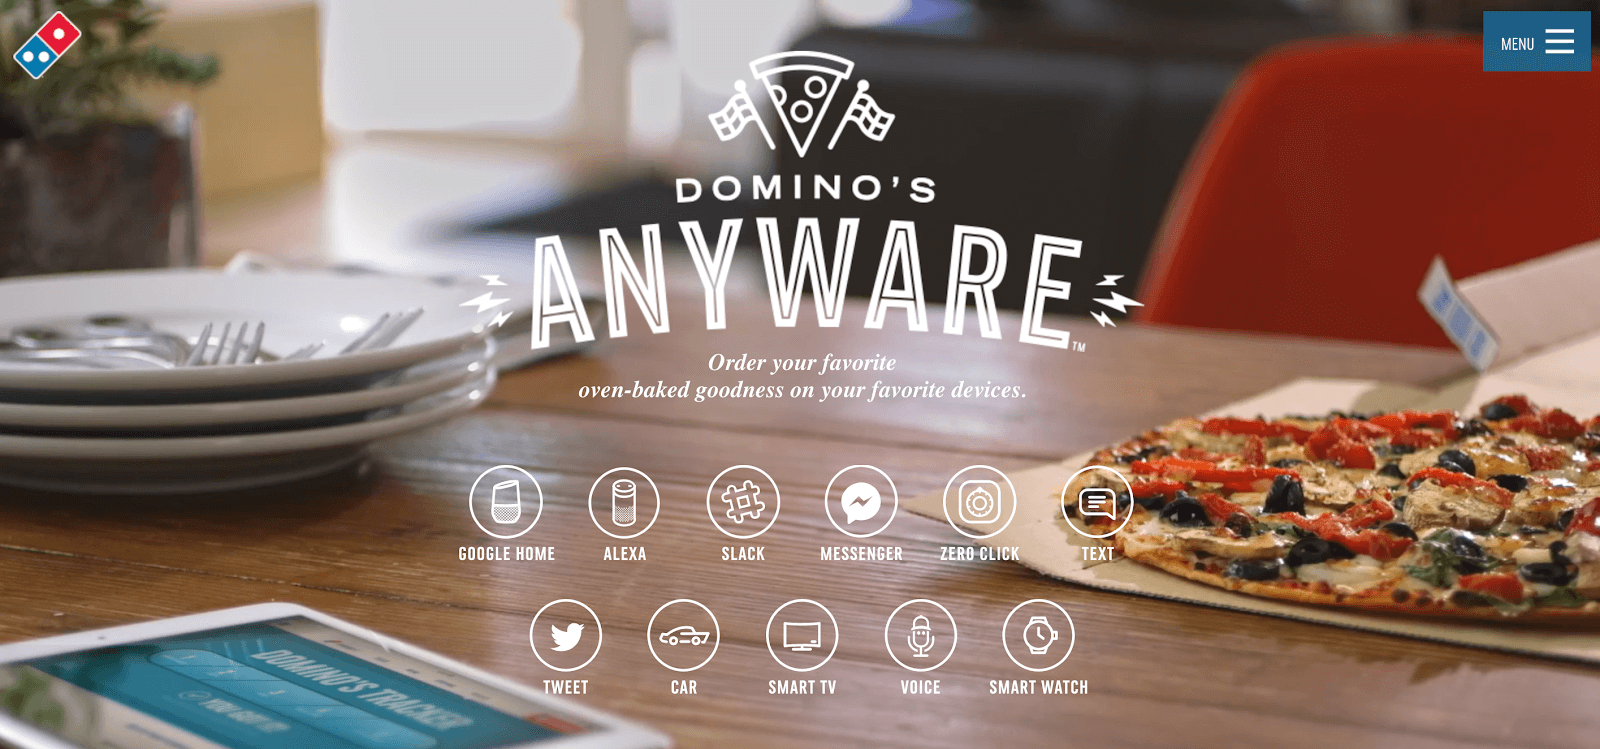 Domino's website anywhere